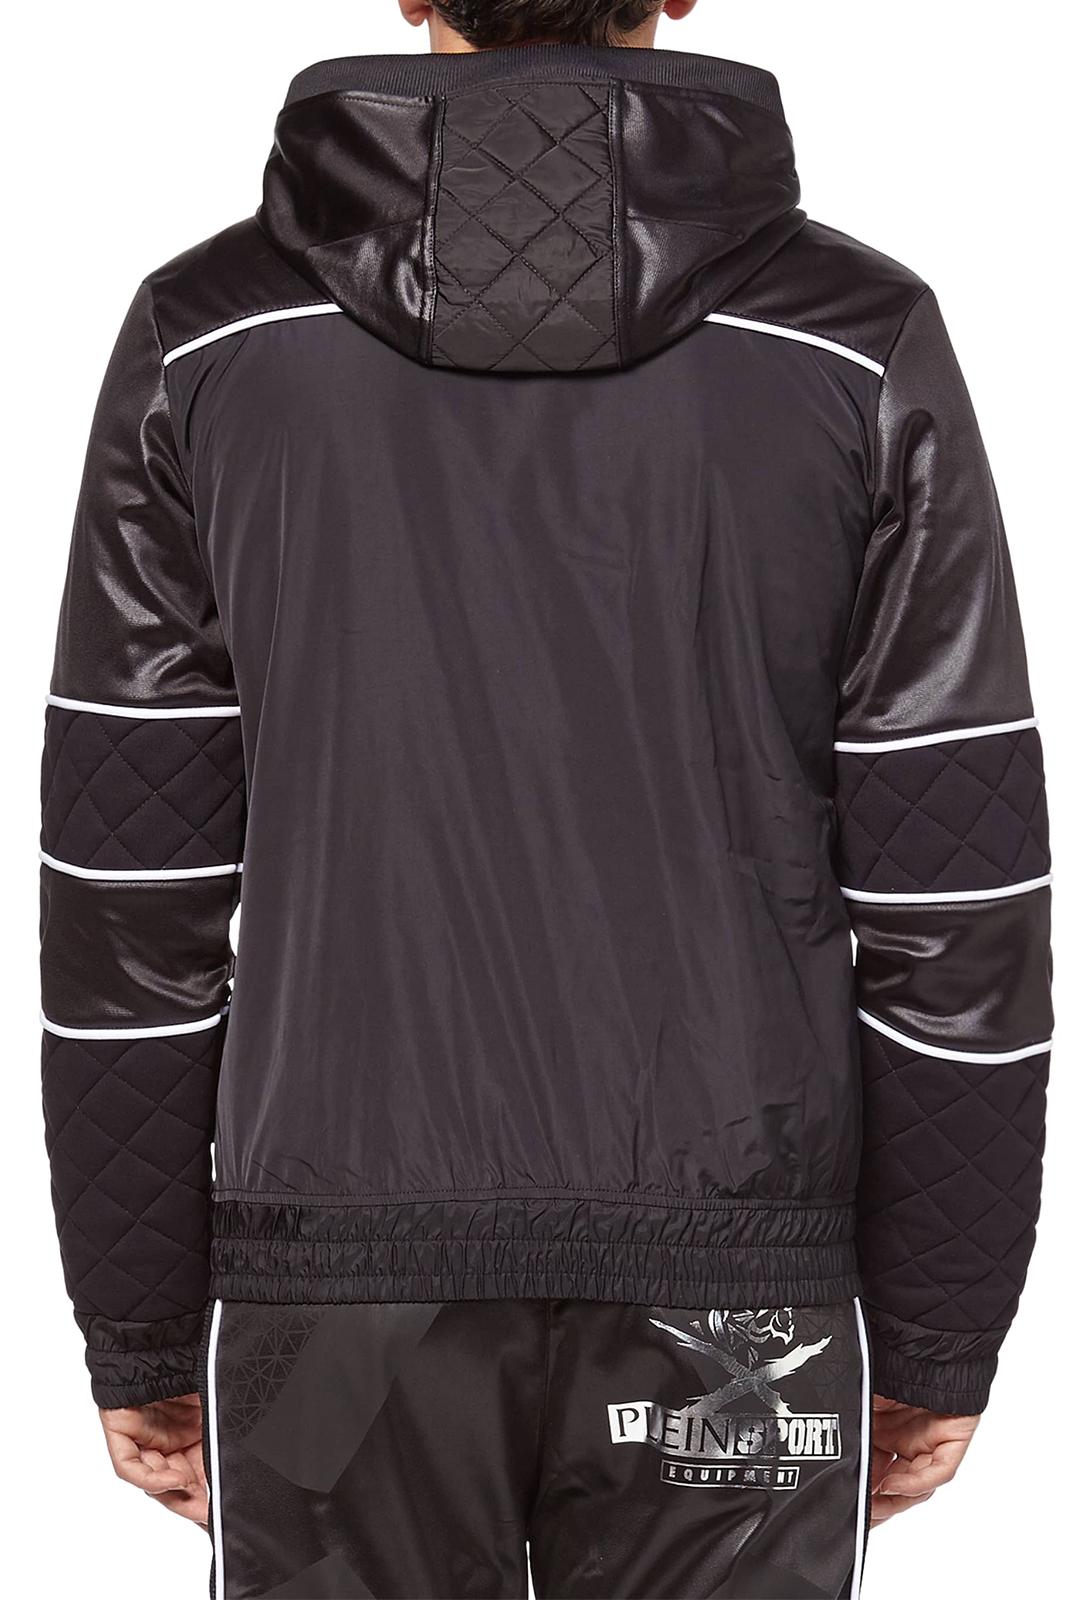 Vestes zippées  Plein Sport F17C MJB0092 02L BLACK GOLD